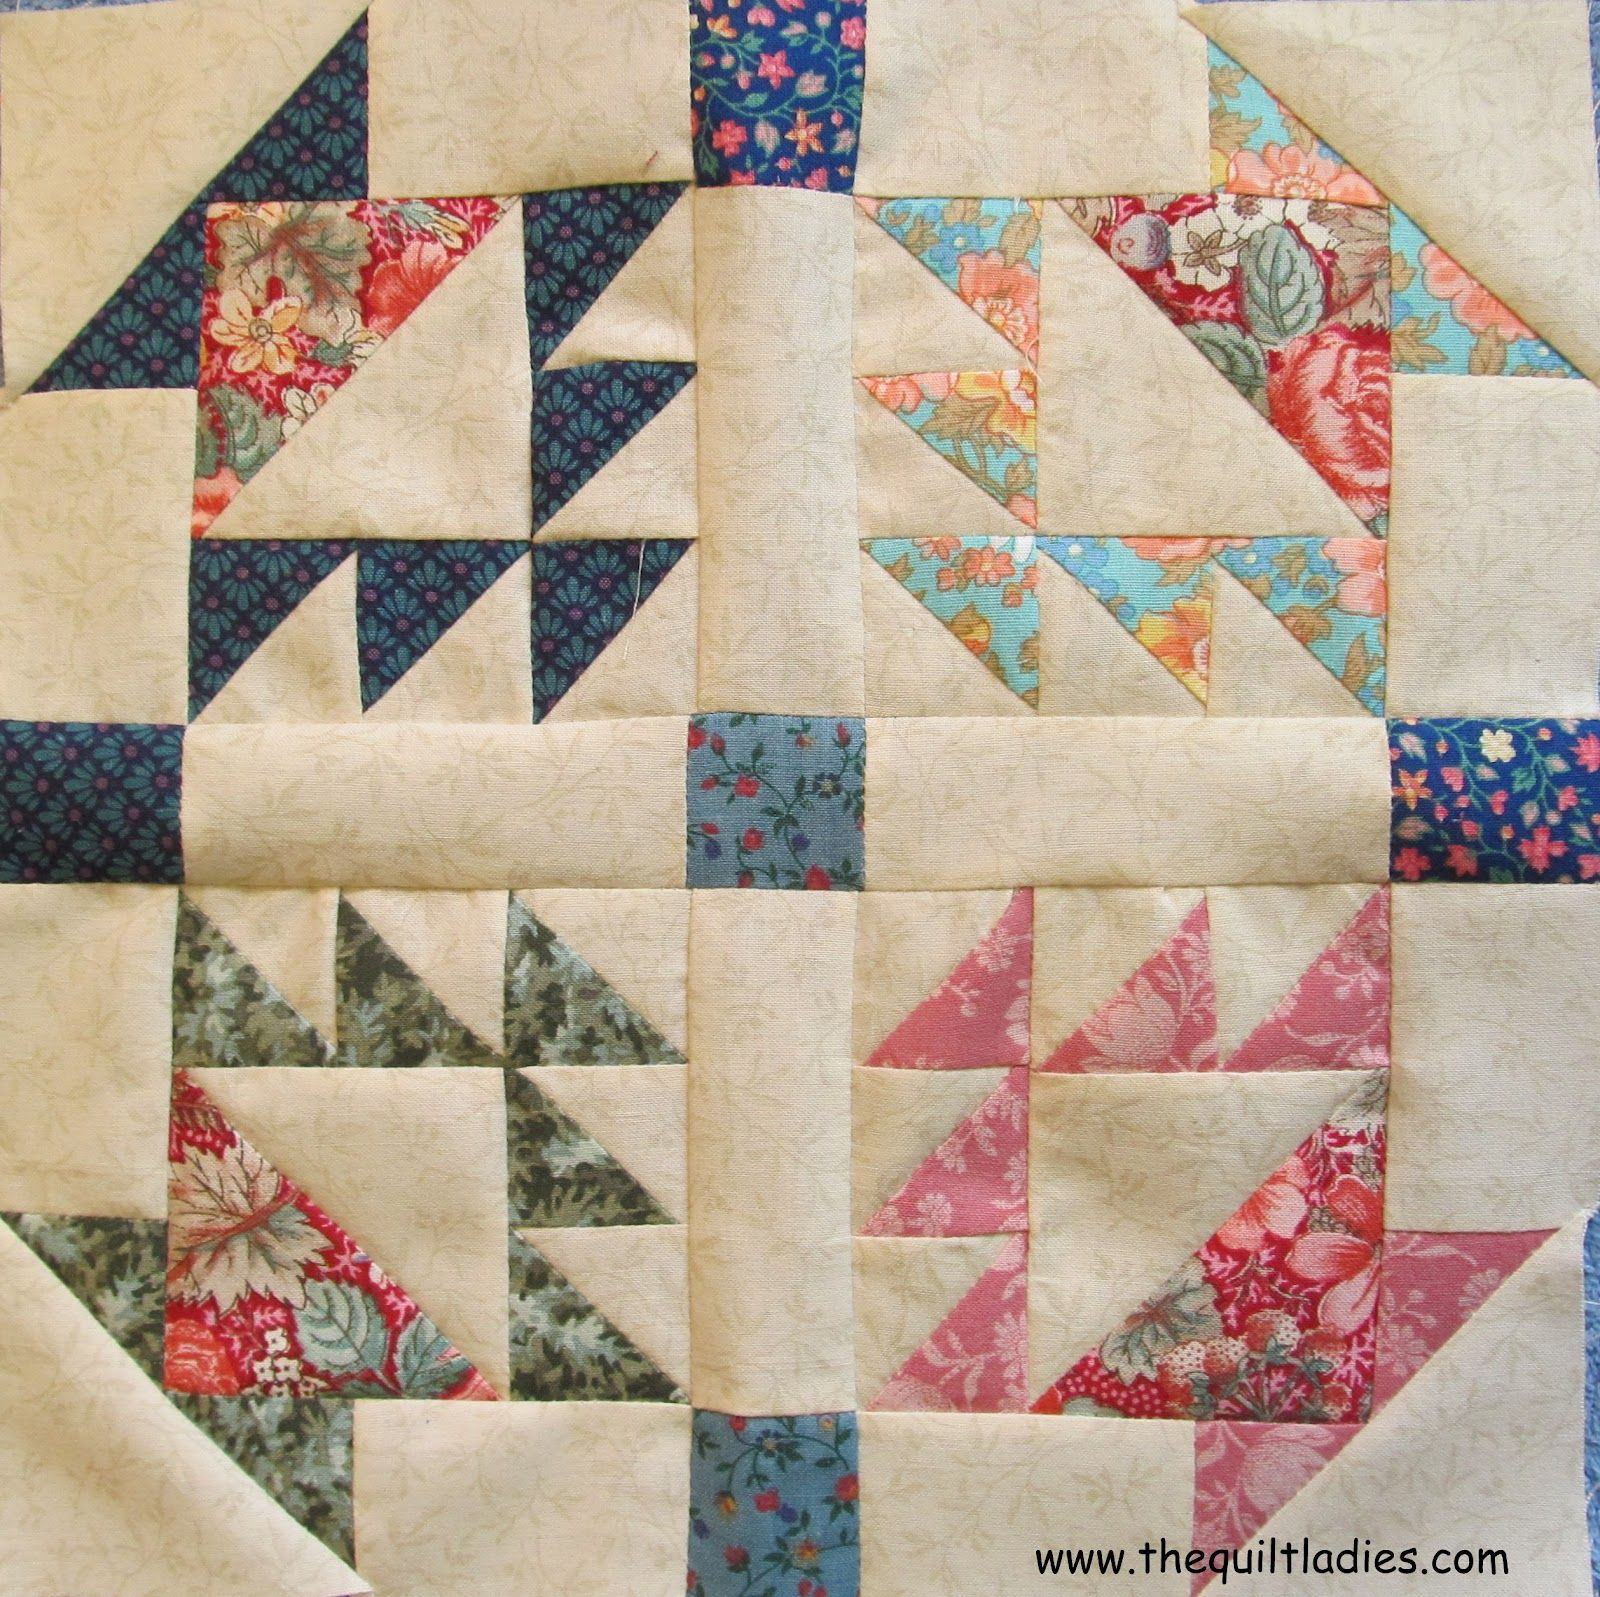 basket quilt pattern block tutorial by The Quilt Ladies | A Quilt ... : basket quilt - Adamdwight.com